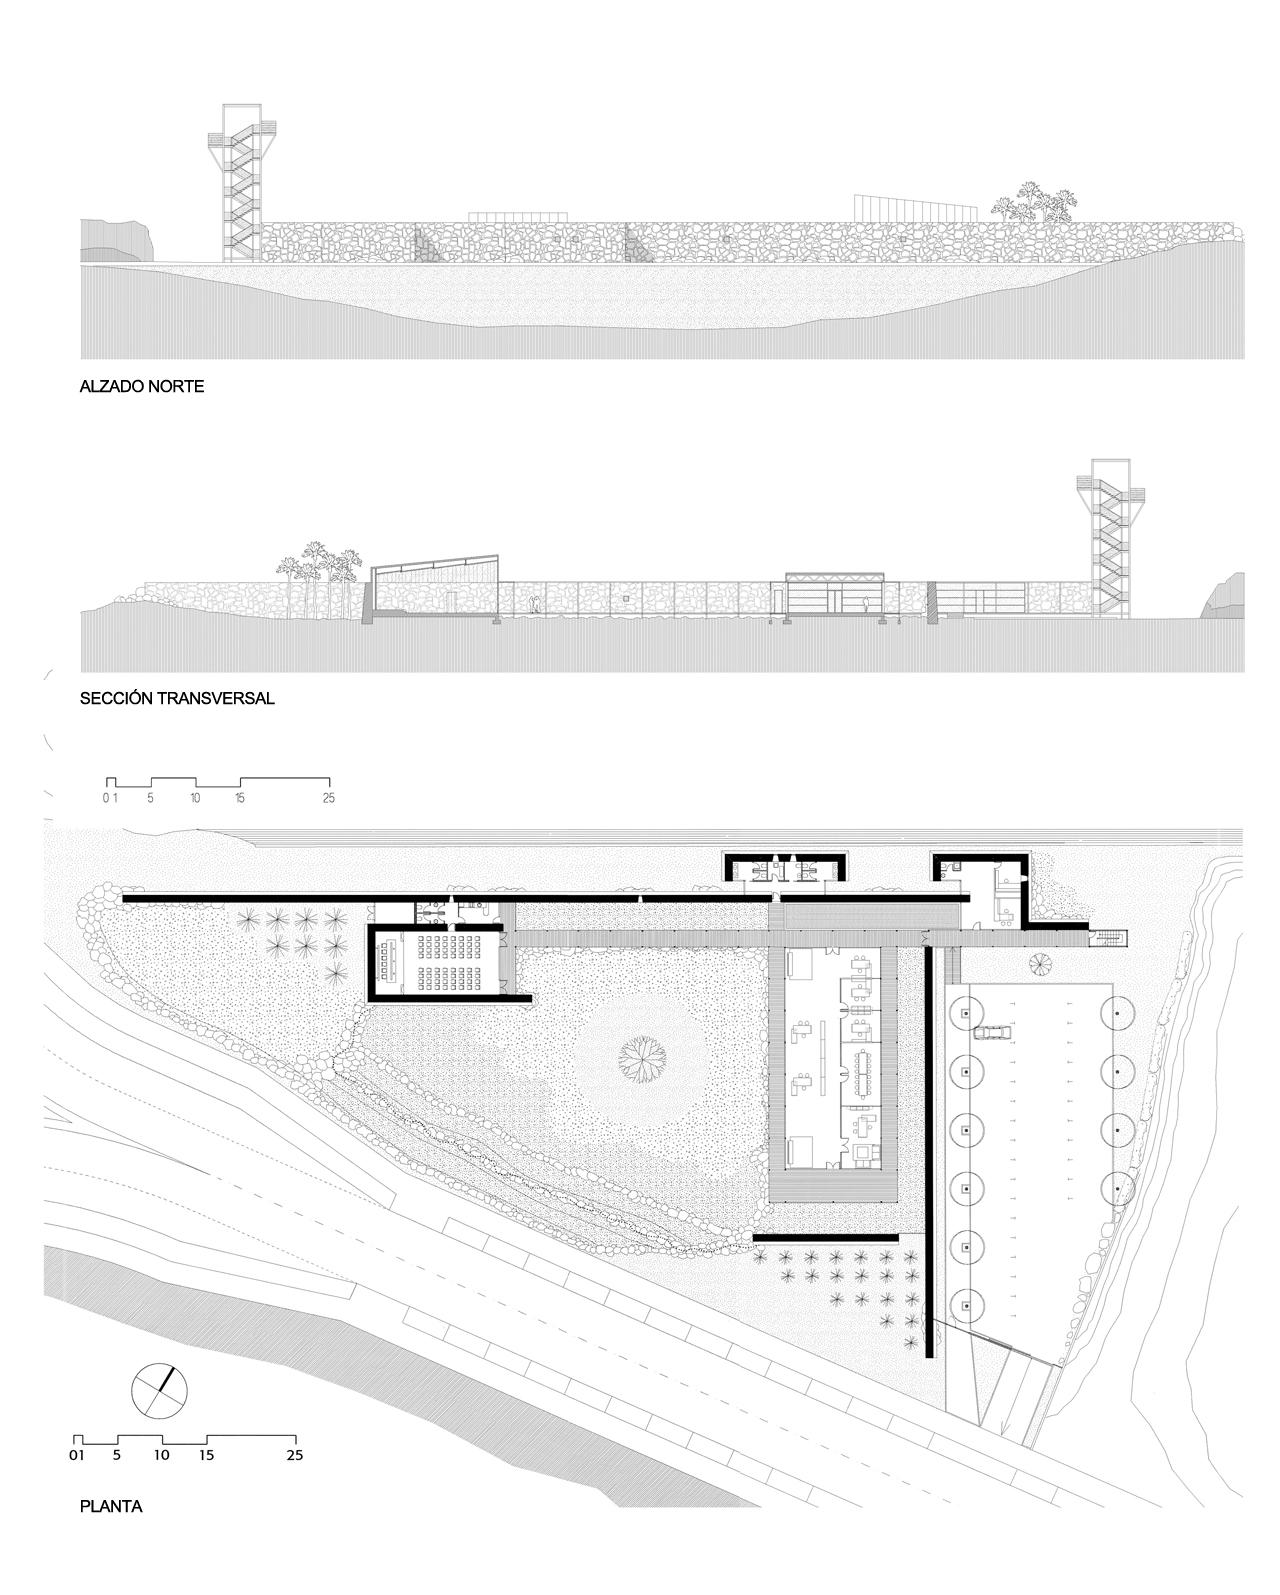 Correa + Estevez Arquitectura - Poligono de Granadilla Plantas.jpg